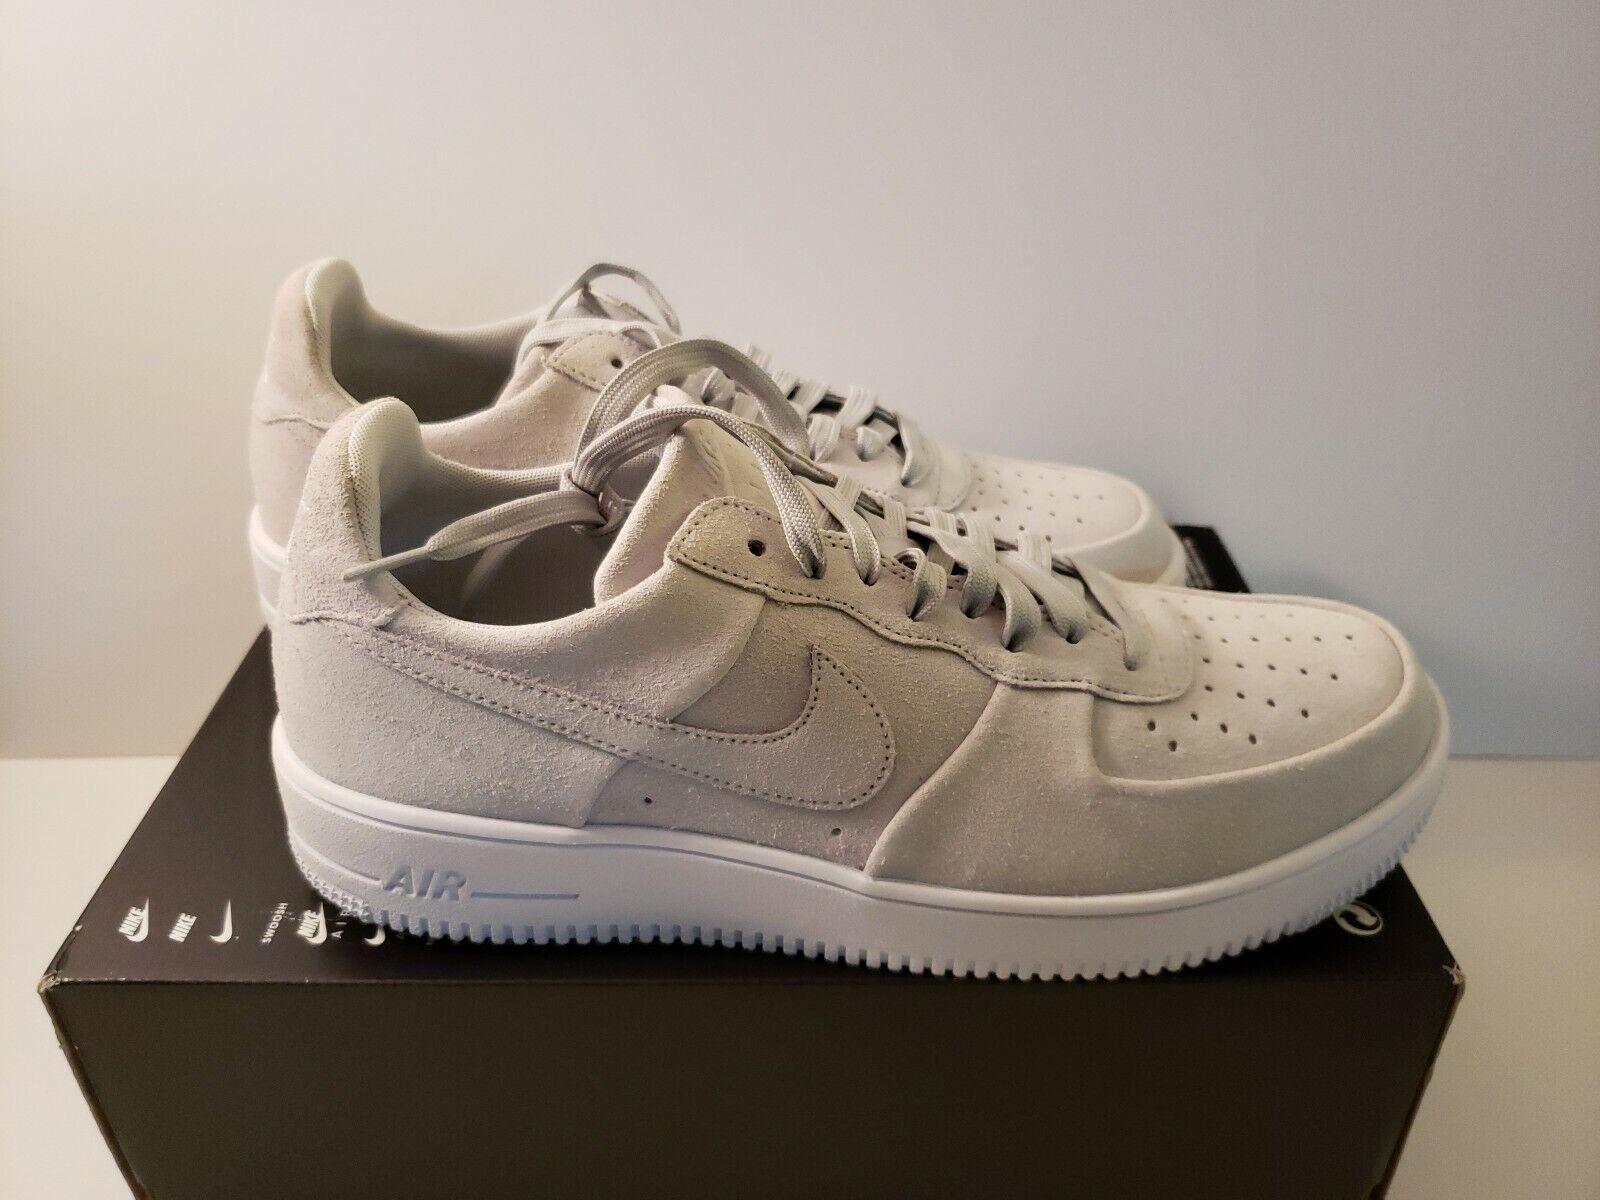 NIKE AIR FORCE 1 ULTRAFORCE Sz 11 & 12 12 12 Pure Platinum White 818735-005 Mens shoes cc7fba